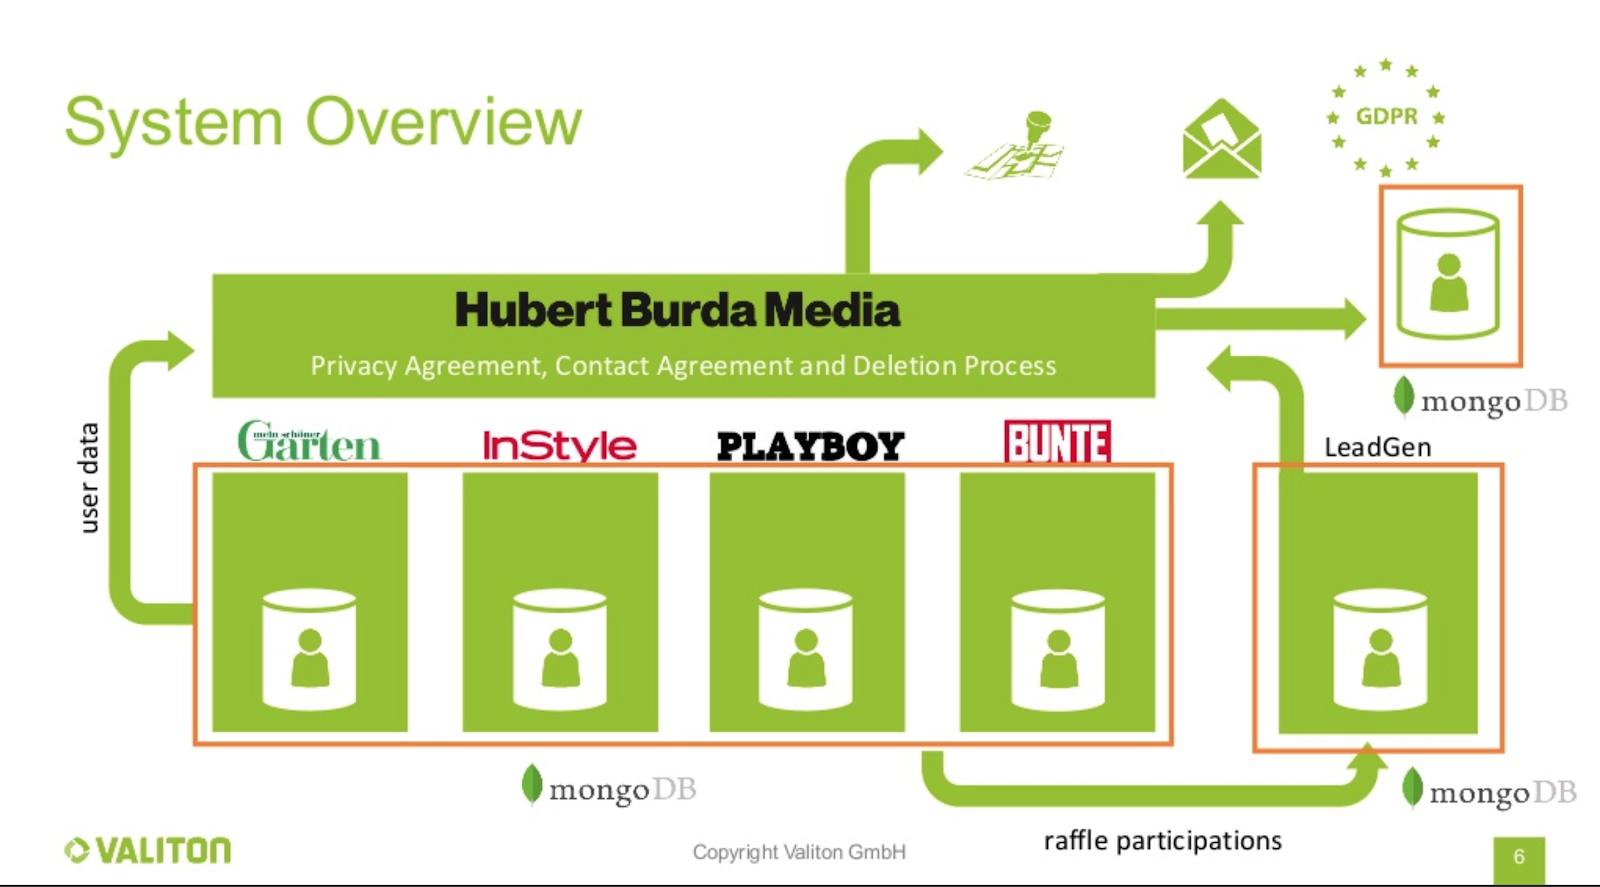 Valiton & MongoDB System Overview